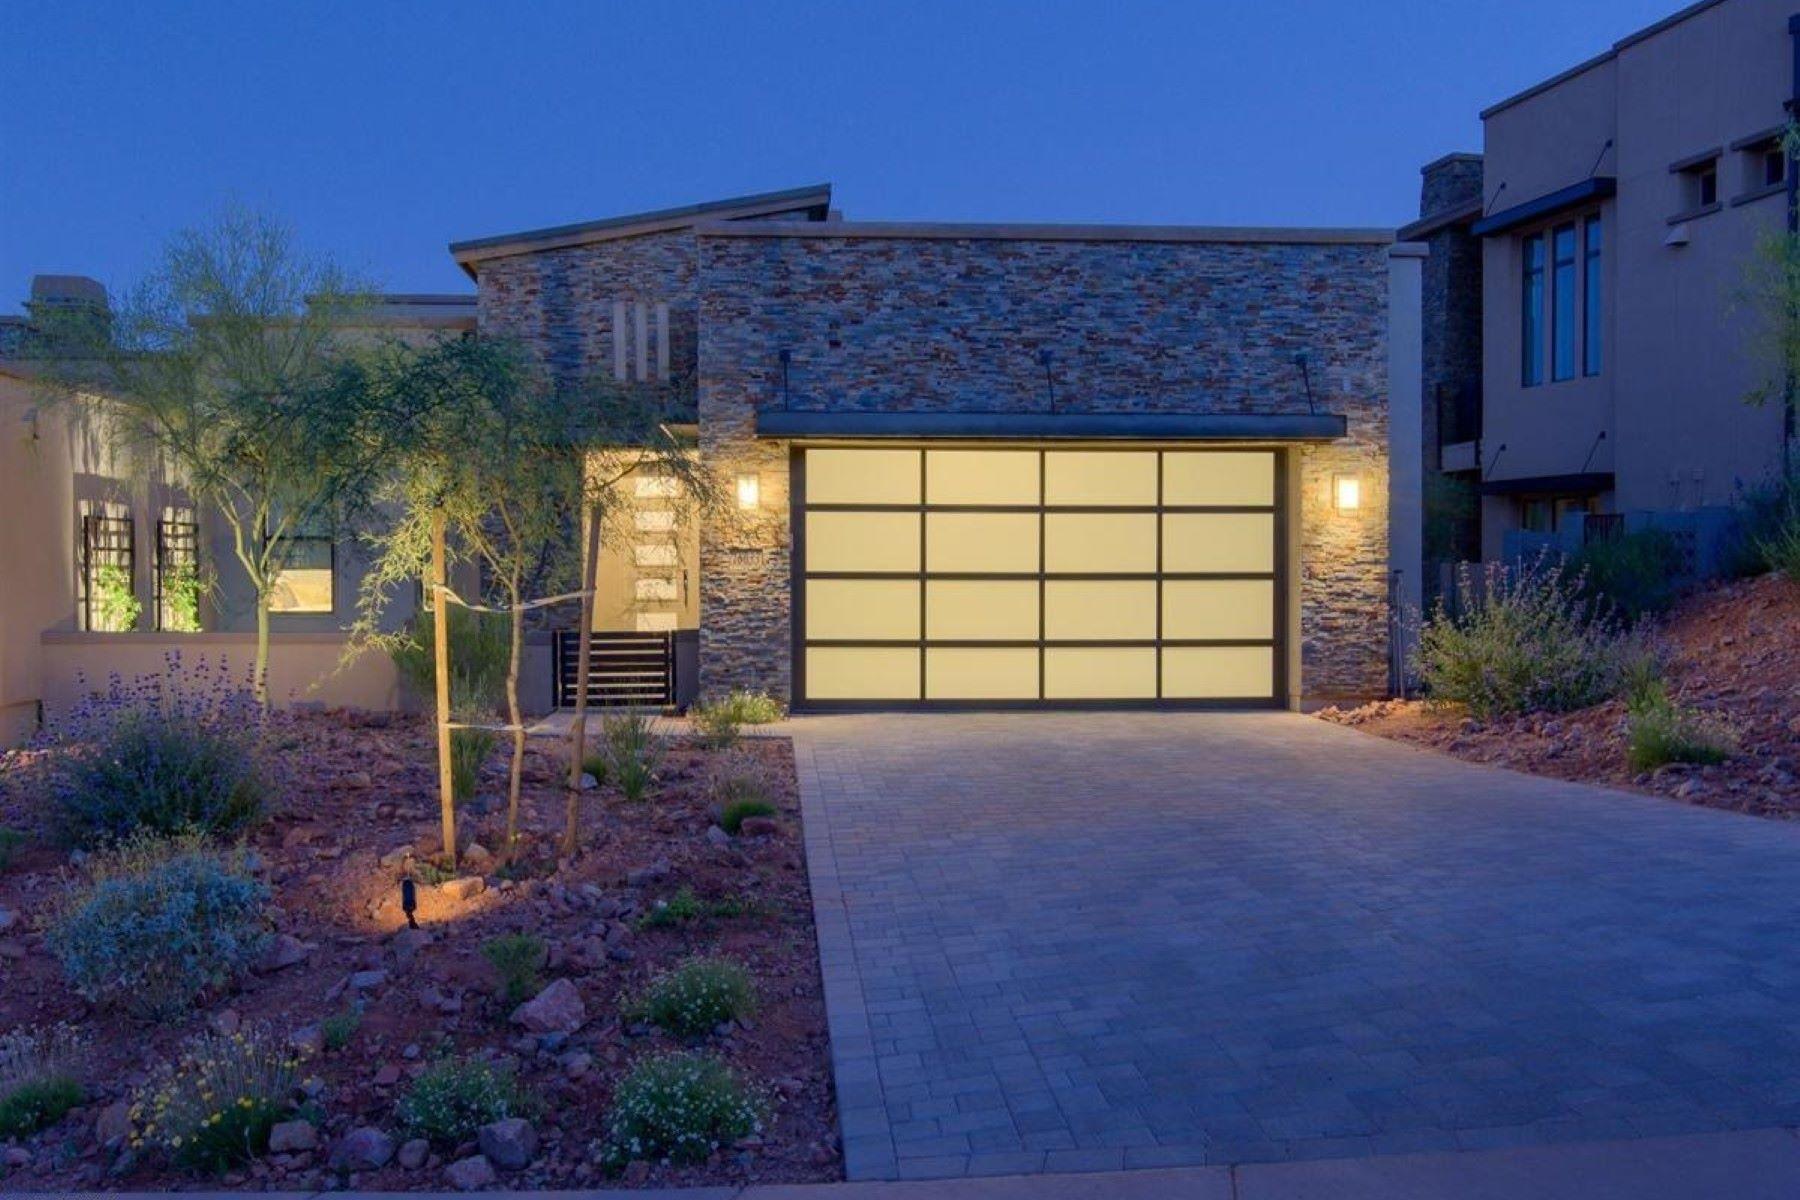 townhouses 为 销售 在 Firerock Condominium 16033 E RIDGESTONE DR Fountain Hills, 亚利桑那州 85268 美国